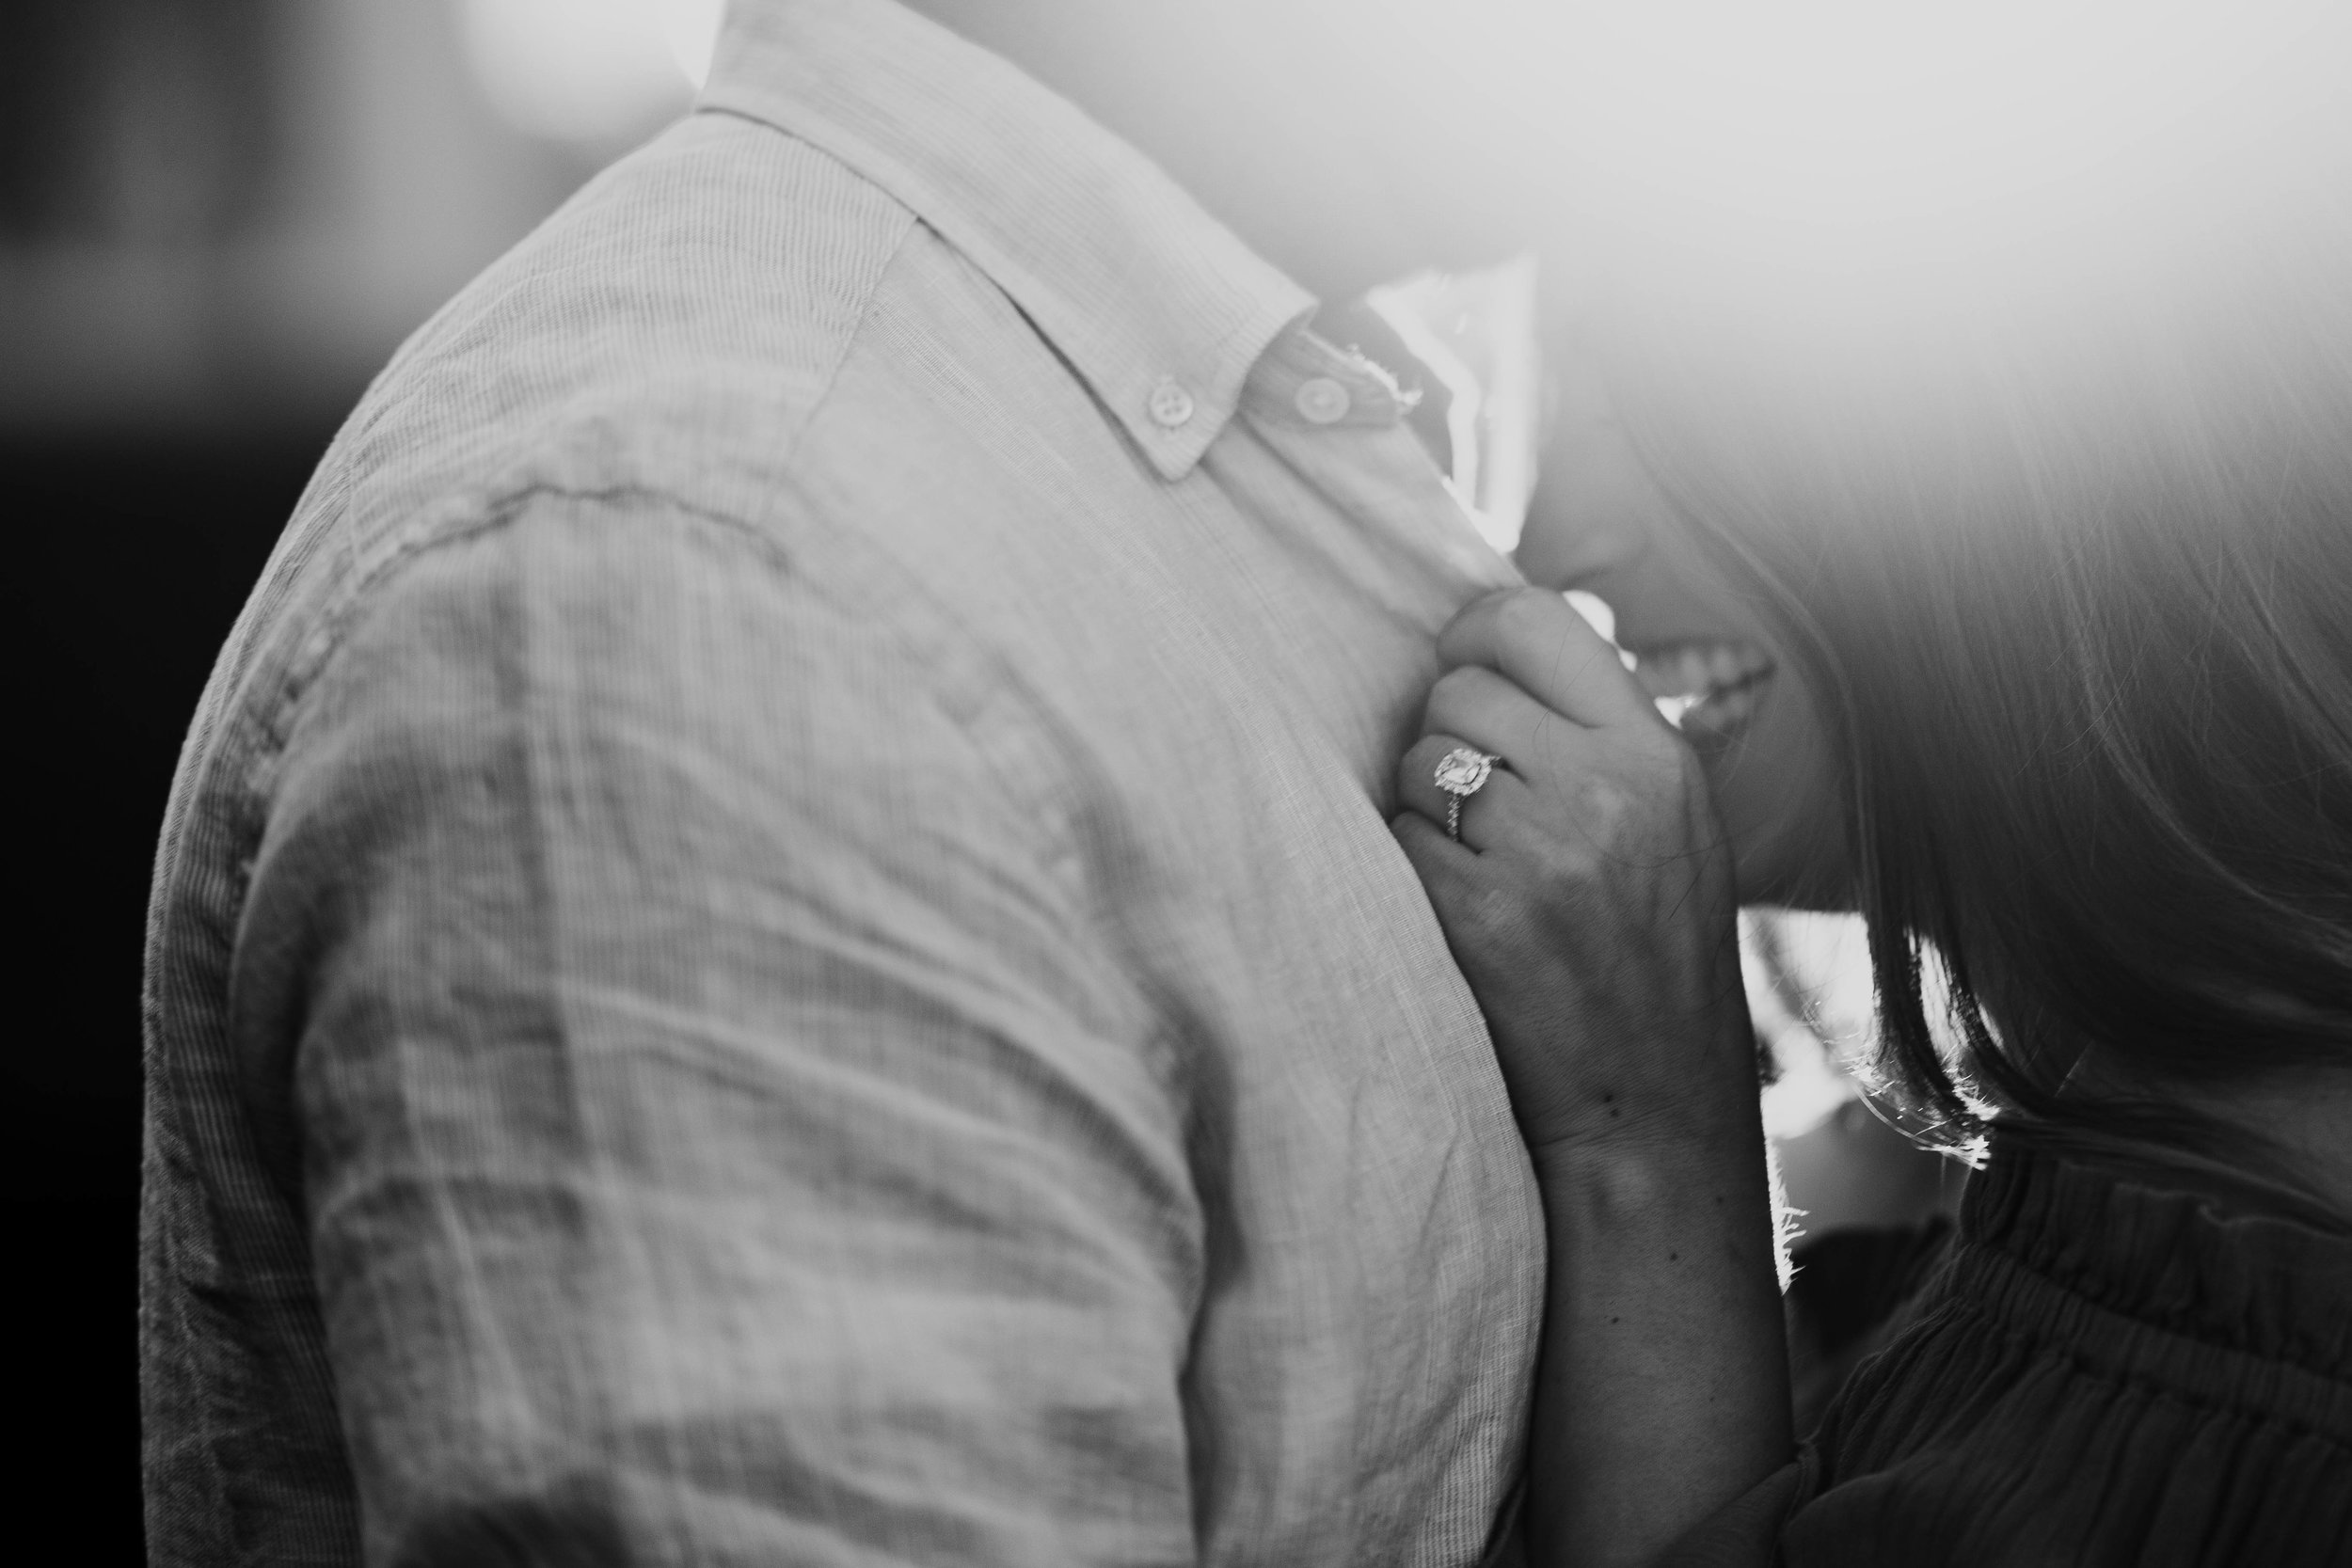 proposal photos / engagement photos / I said yes / henri daussi engagement ring